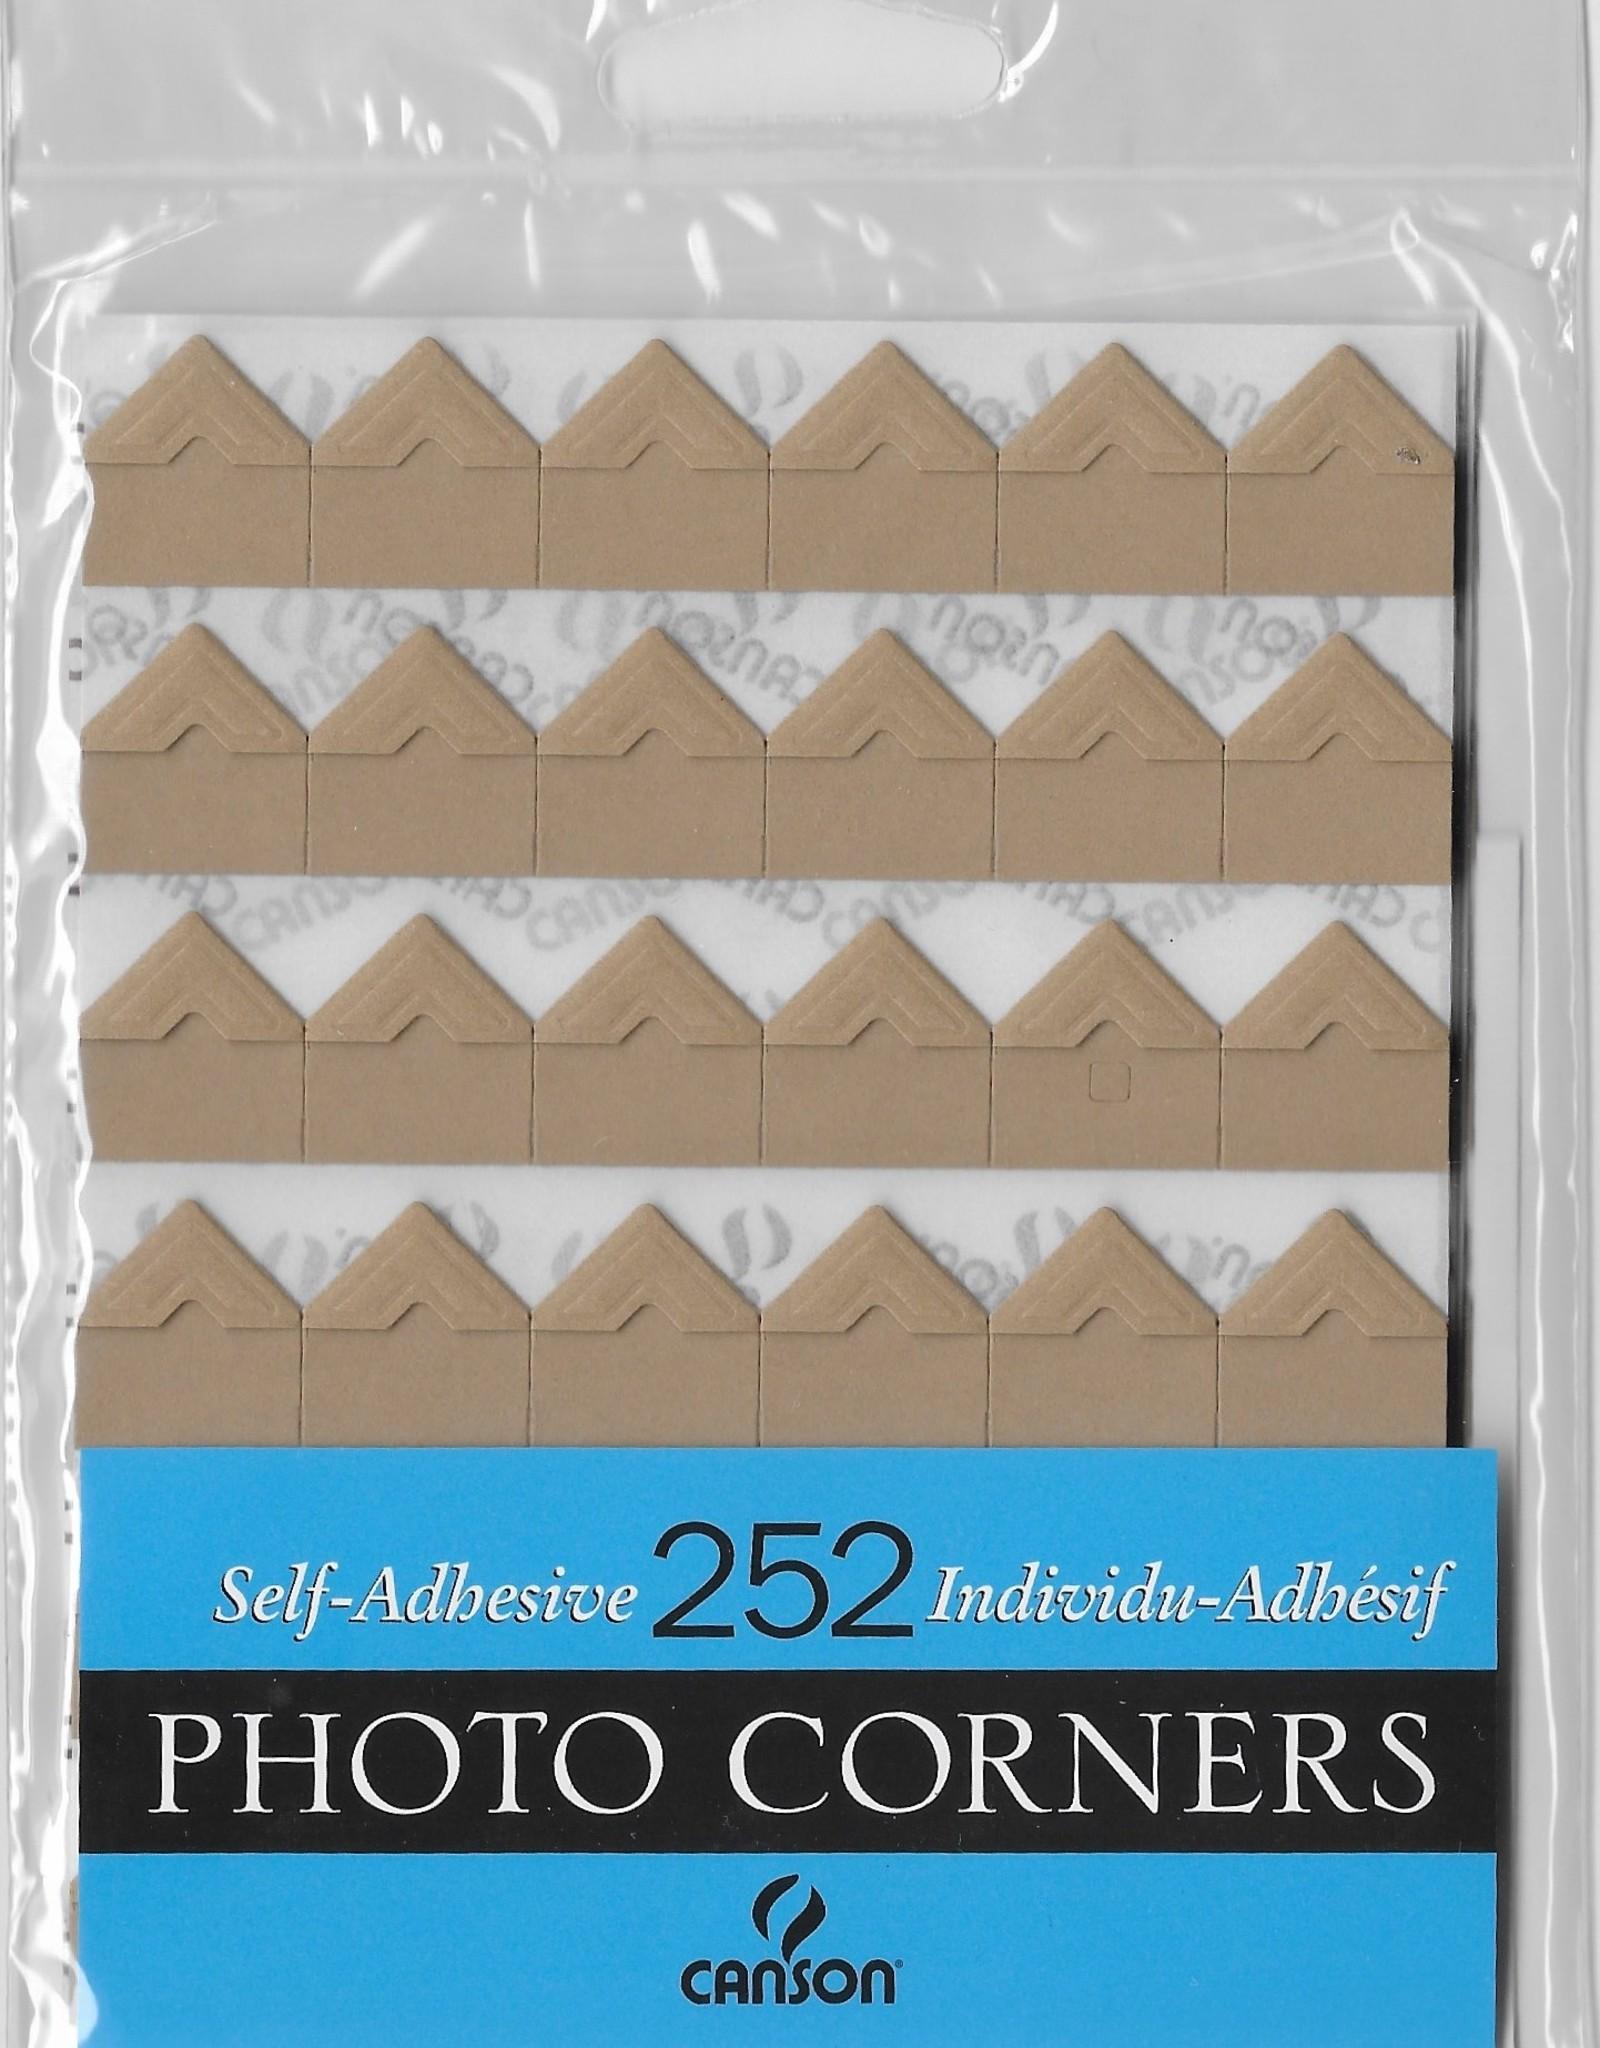 Self-Adhesive Photo Corners, Kraft, Pack of 252